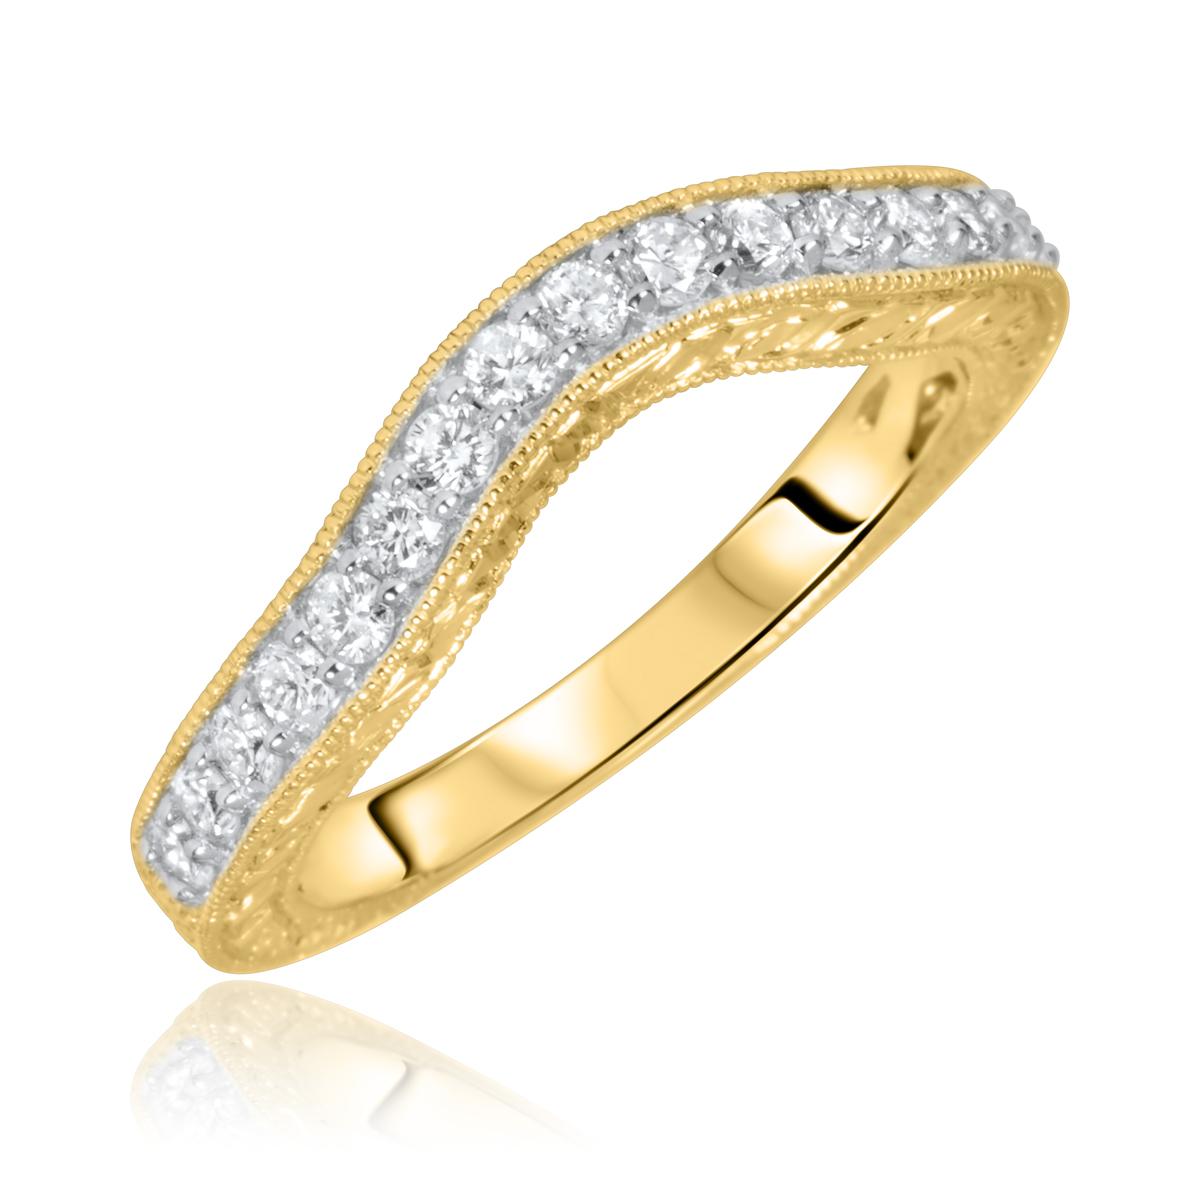 1/2 Carat T.W. Round Cut Diamond Ladies Wedding Band 10K Yellow Gold- Size 8